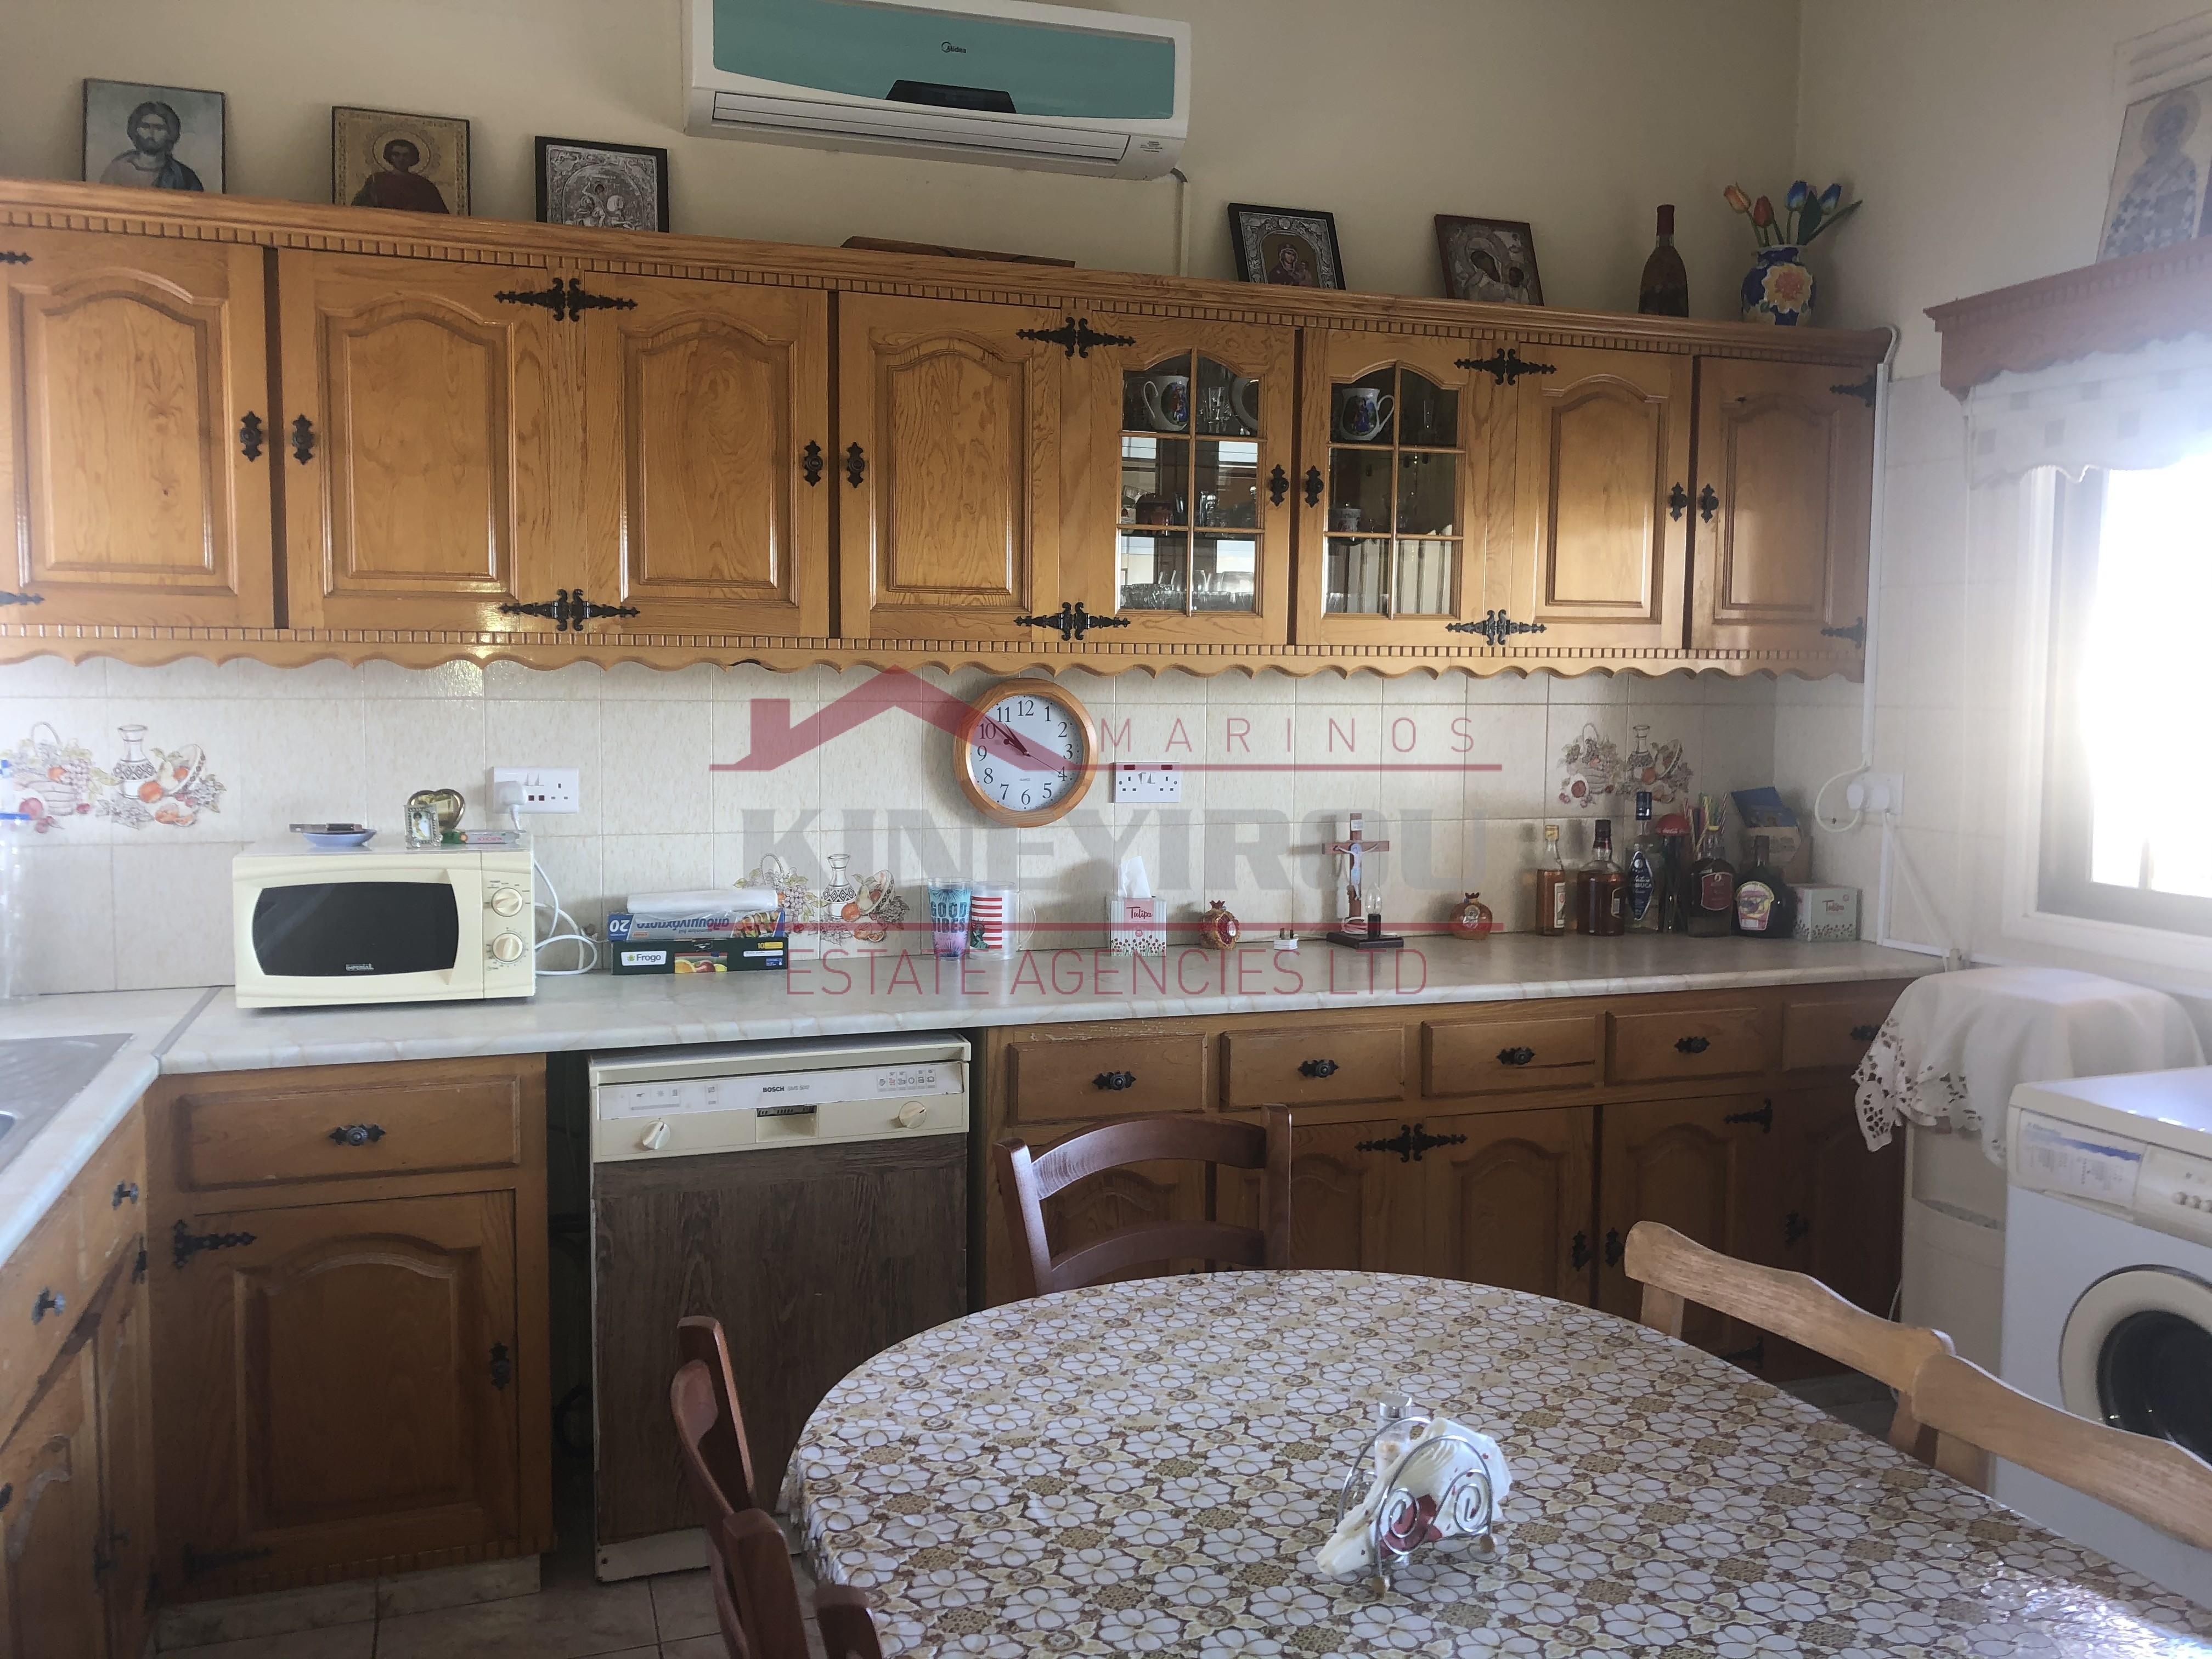 3 bedroom apartment for rent in Dromalaxia – Larnaca